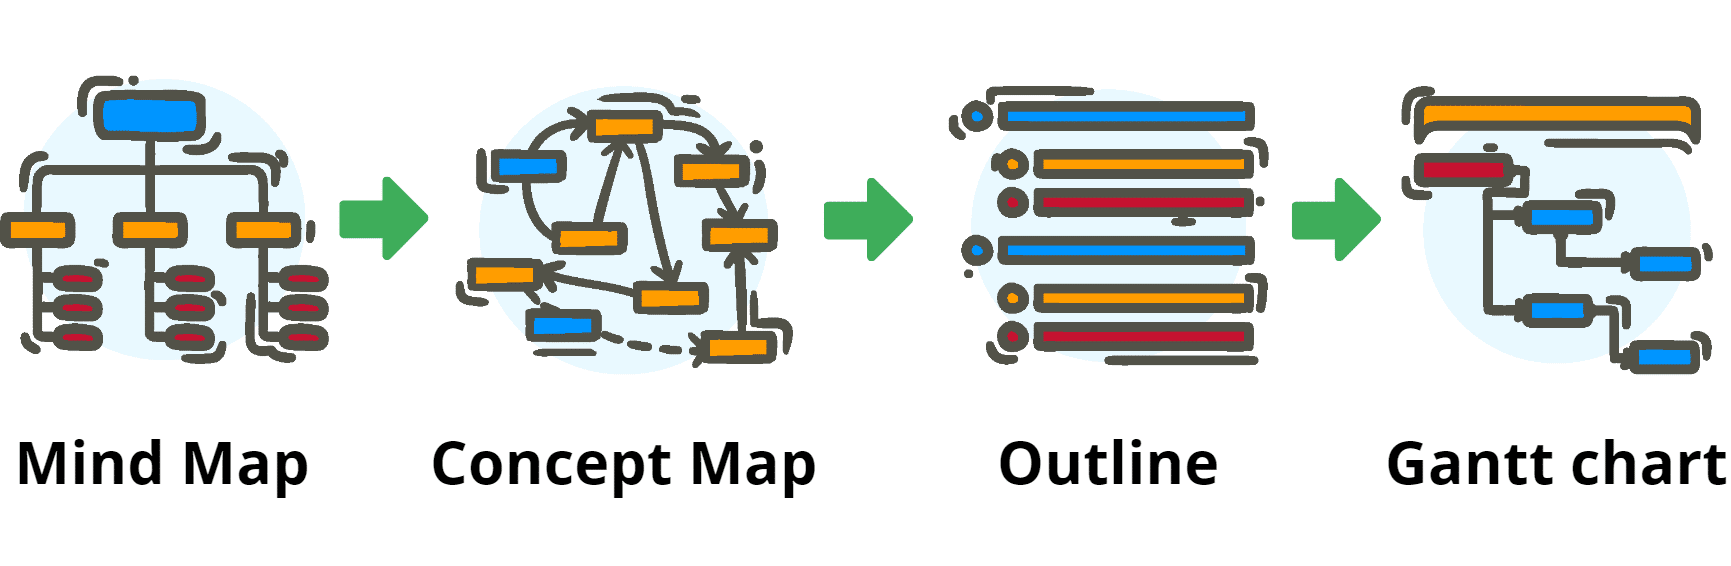 transform mind maps